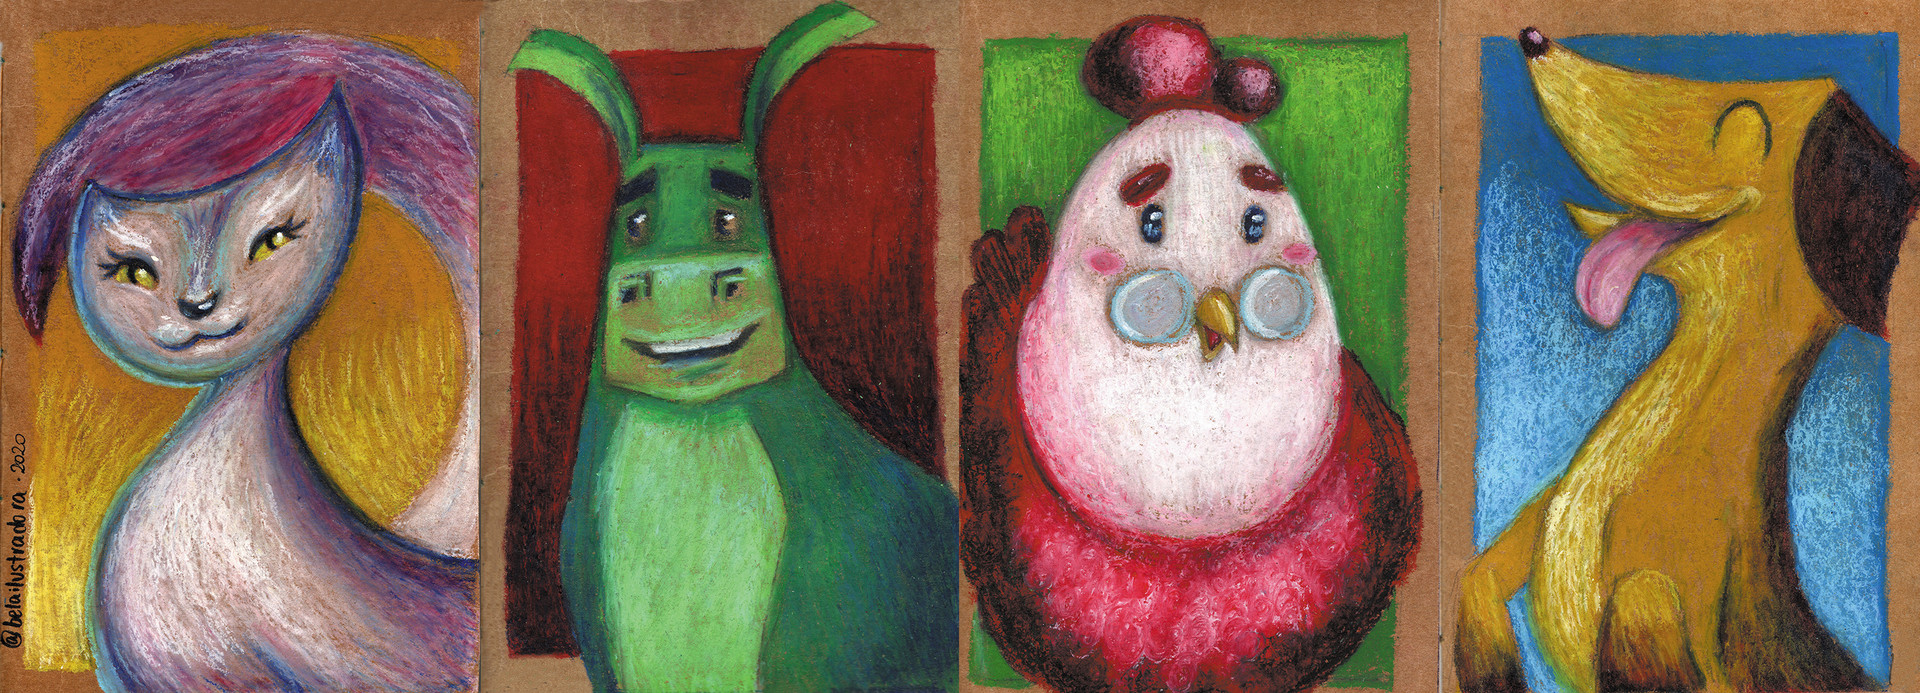 personagens menor 2.jpg